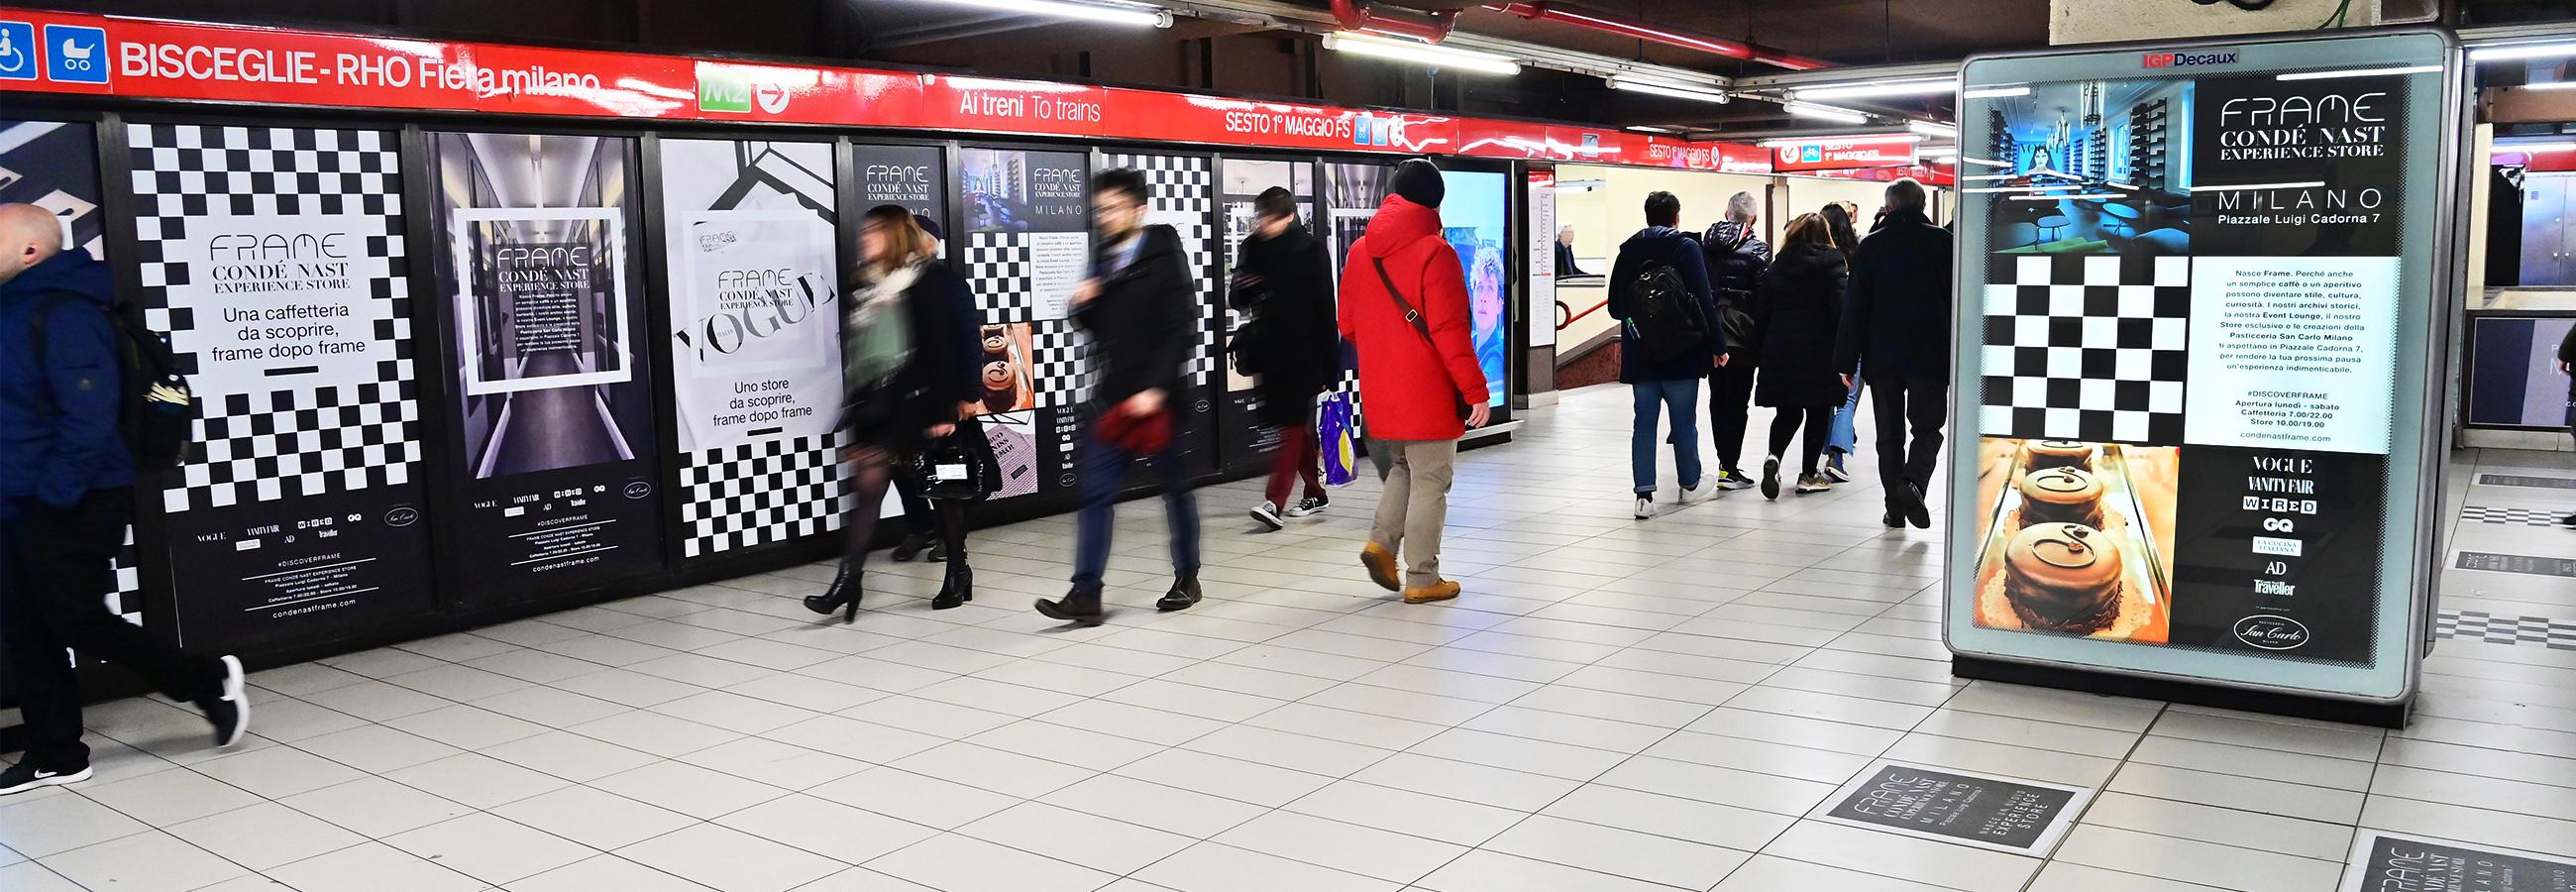 Station Domination IGPDecaux a Milano per Condé Nast